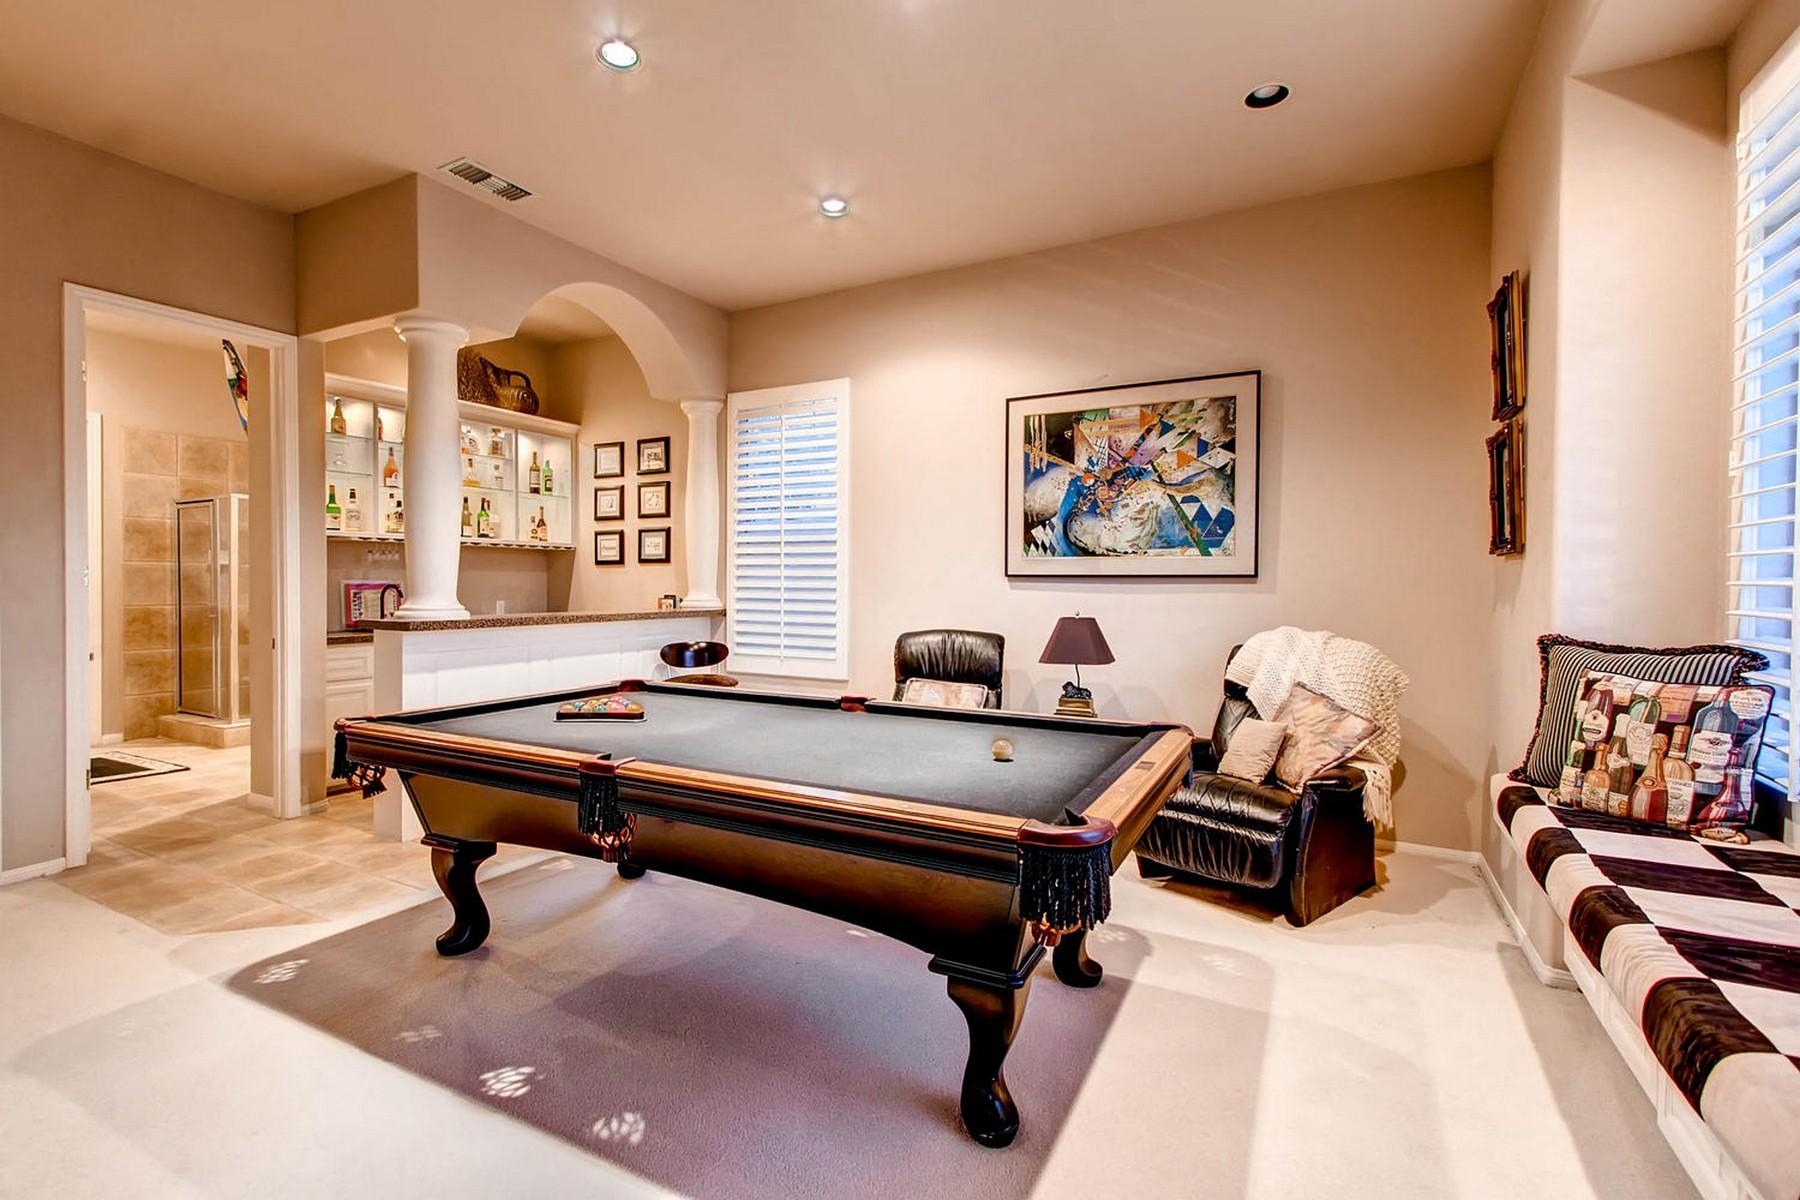 Additional photo for property listing at 3157 Via Viejas Oeste South  Alpine, Californie 91901 États-Unis